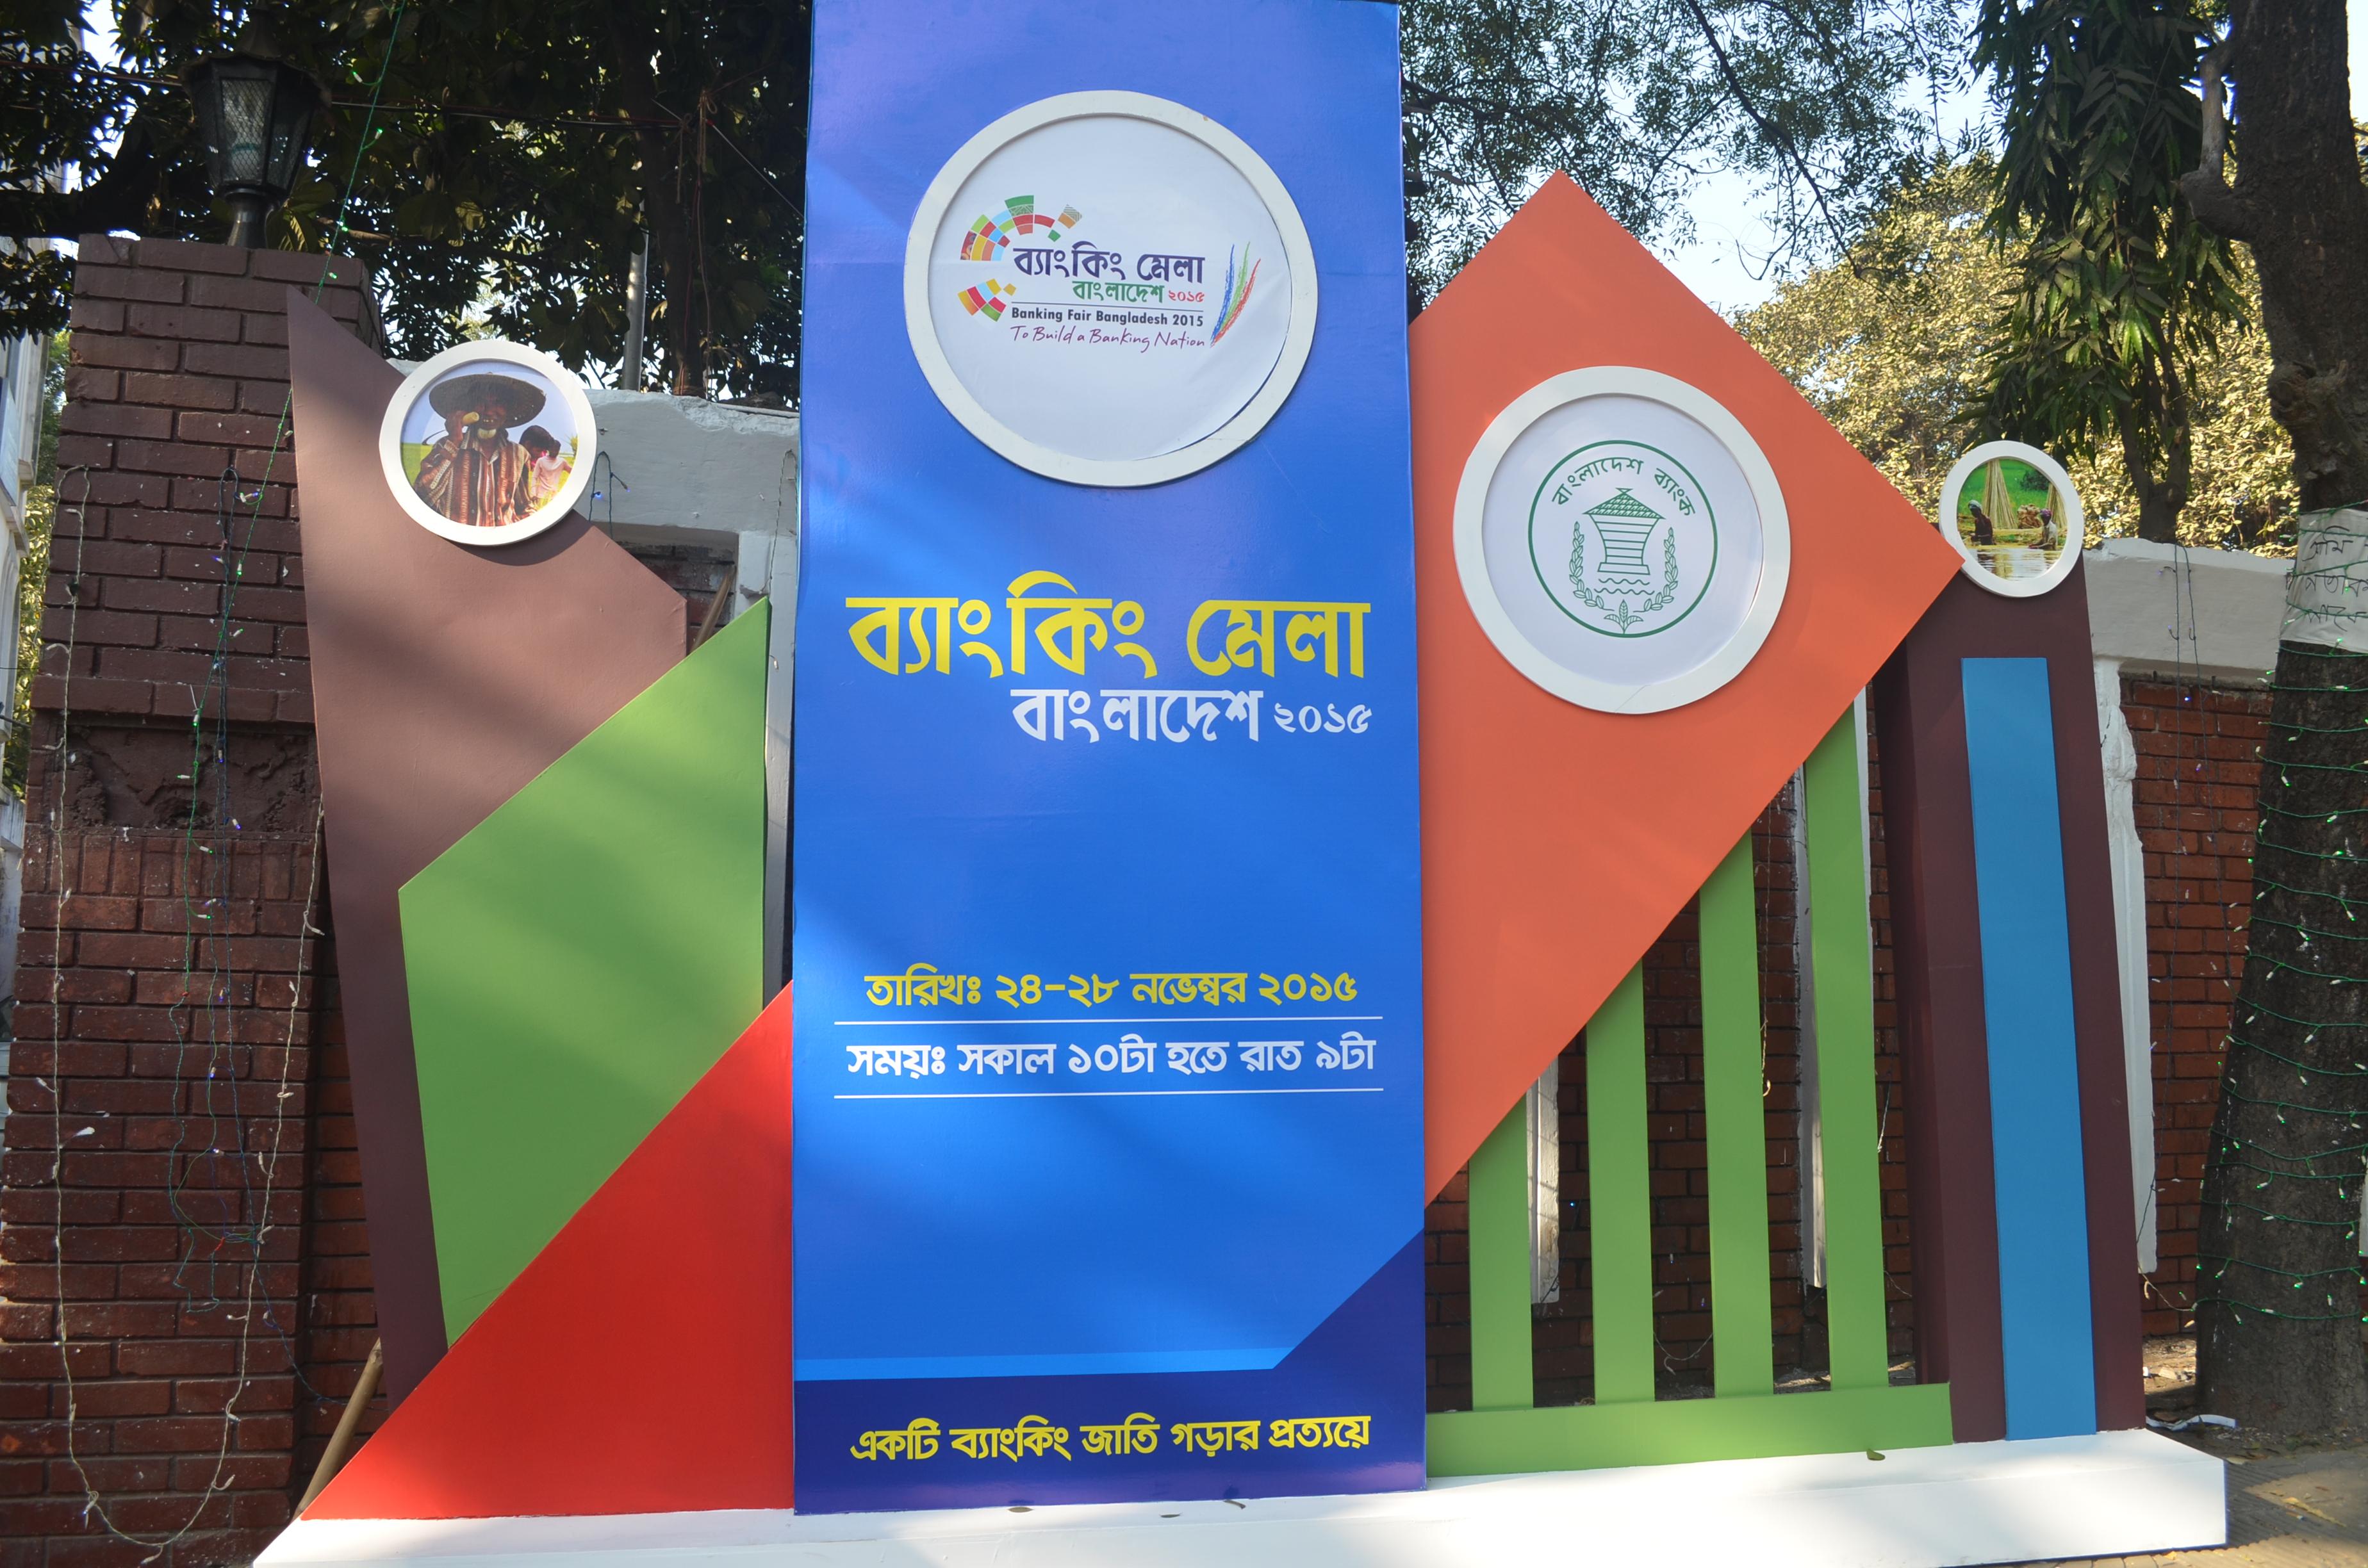 Banking Fair Bangladesh Banner